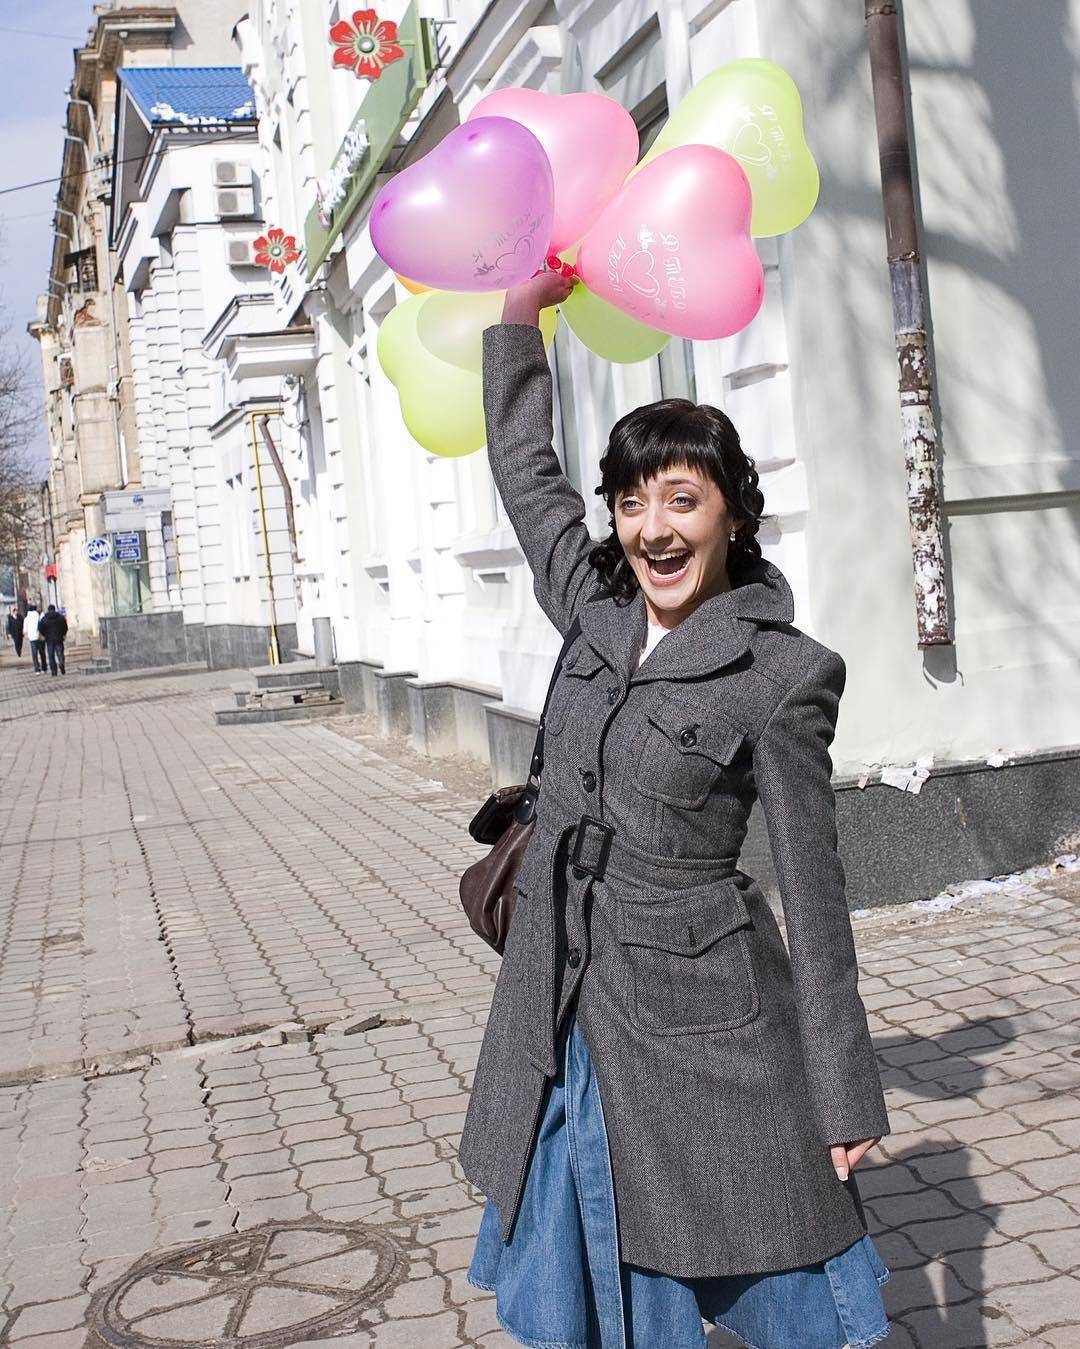 Волна накатила: Беременная Снежана Бабкина опубликовала позитивное фото